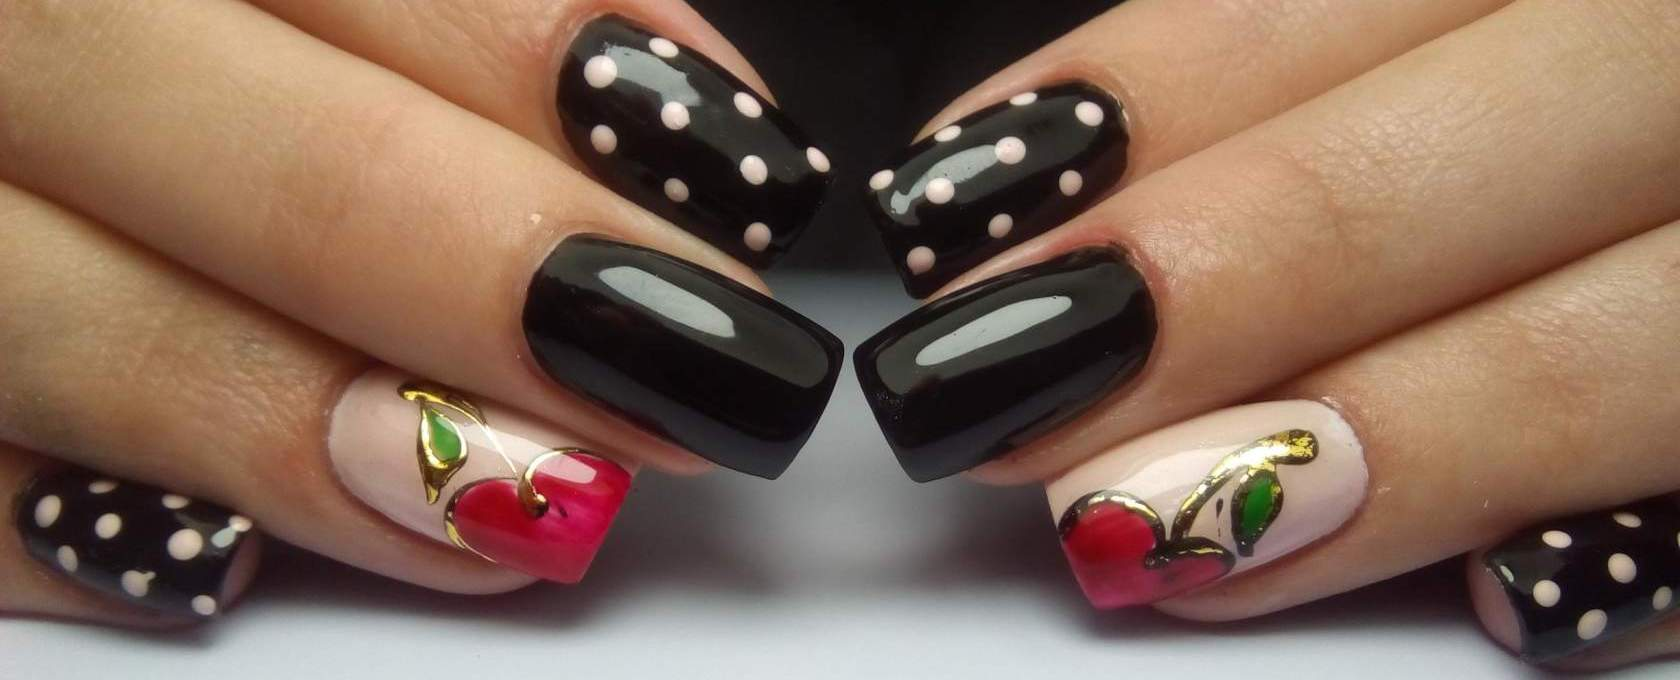 Дизайн ногтей и вишенками фото